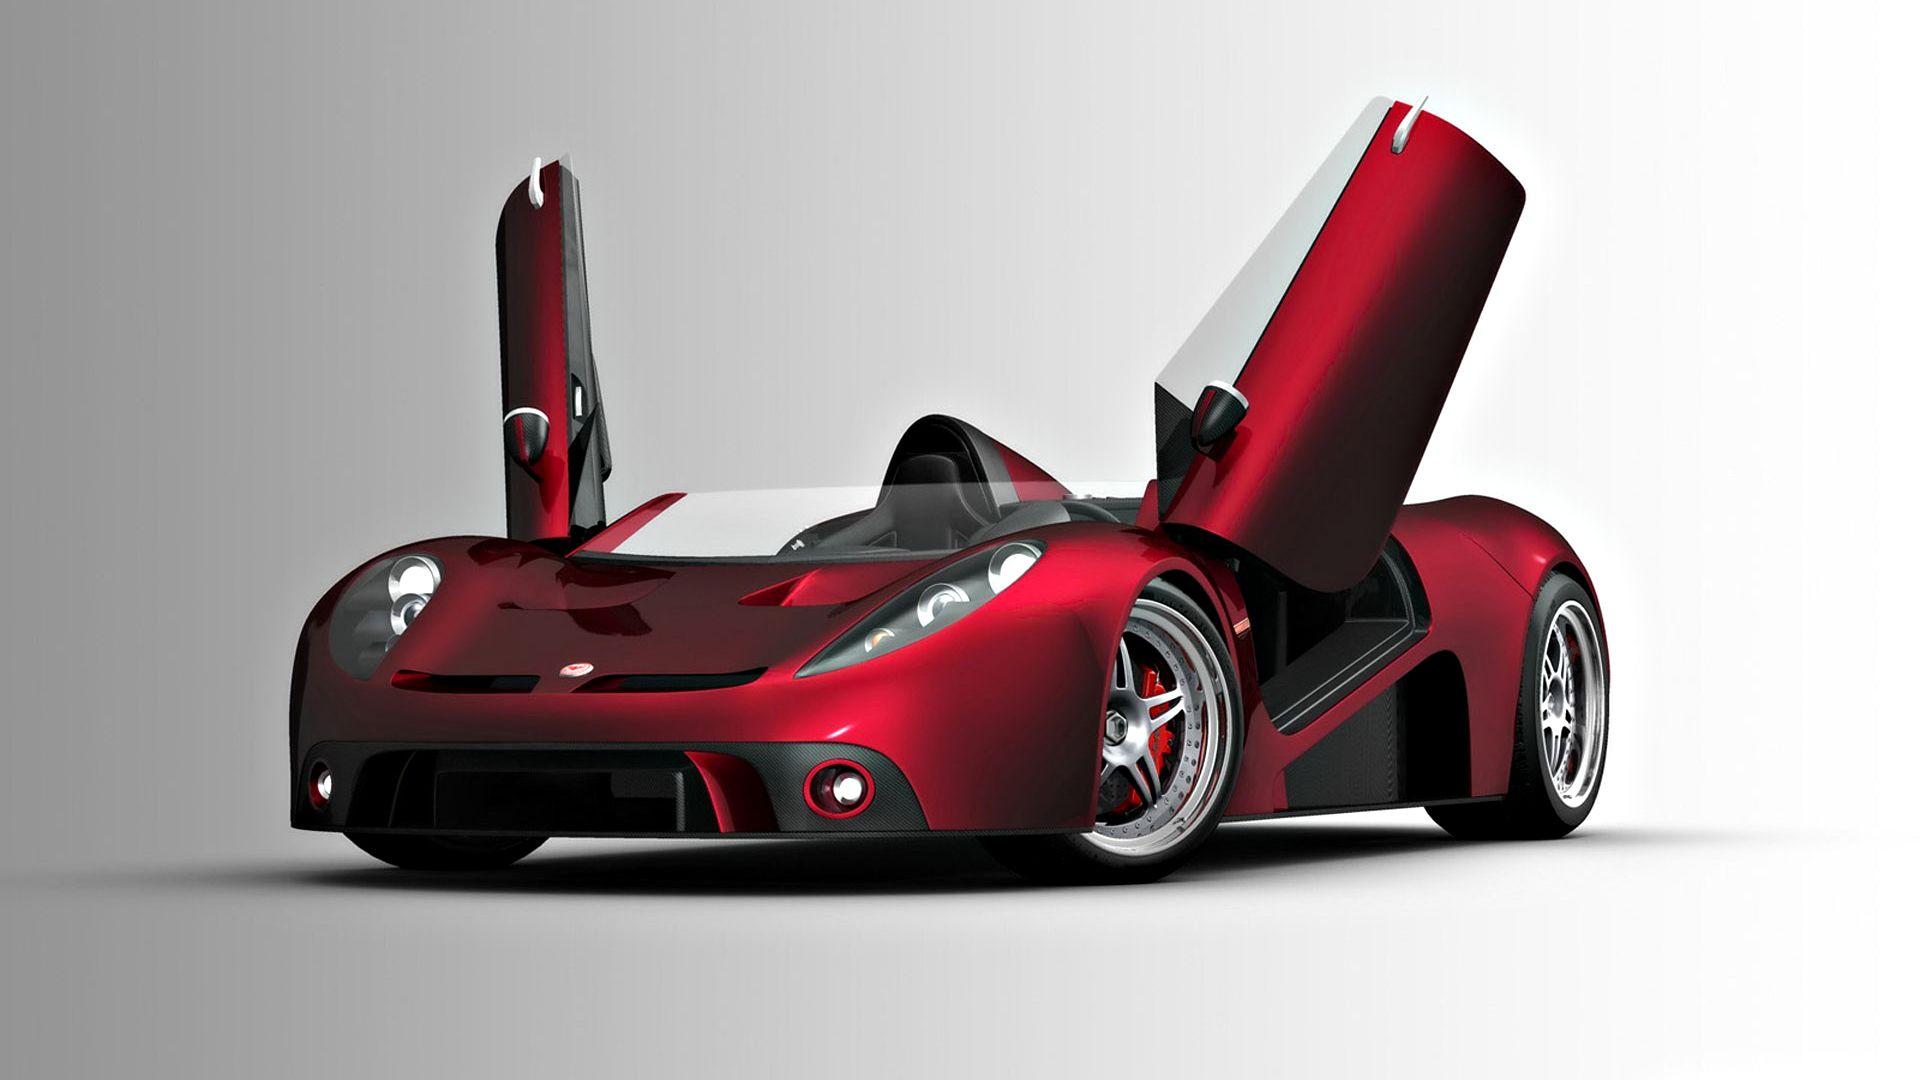 Imagenes De Fondos De Carros Como Fondos Imagenes De Autos: Imagenes+De+Carros+Chingones+Para+Fondo+De+Pantalla